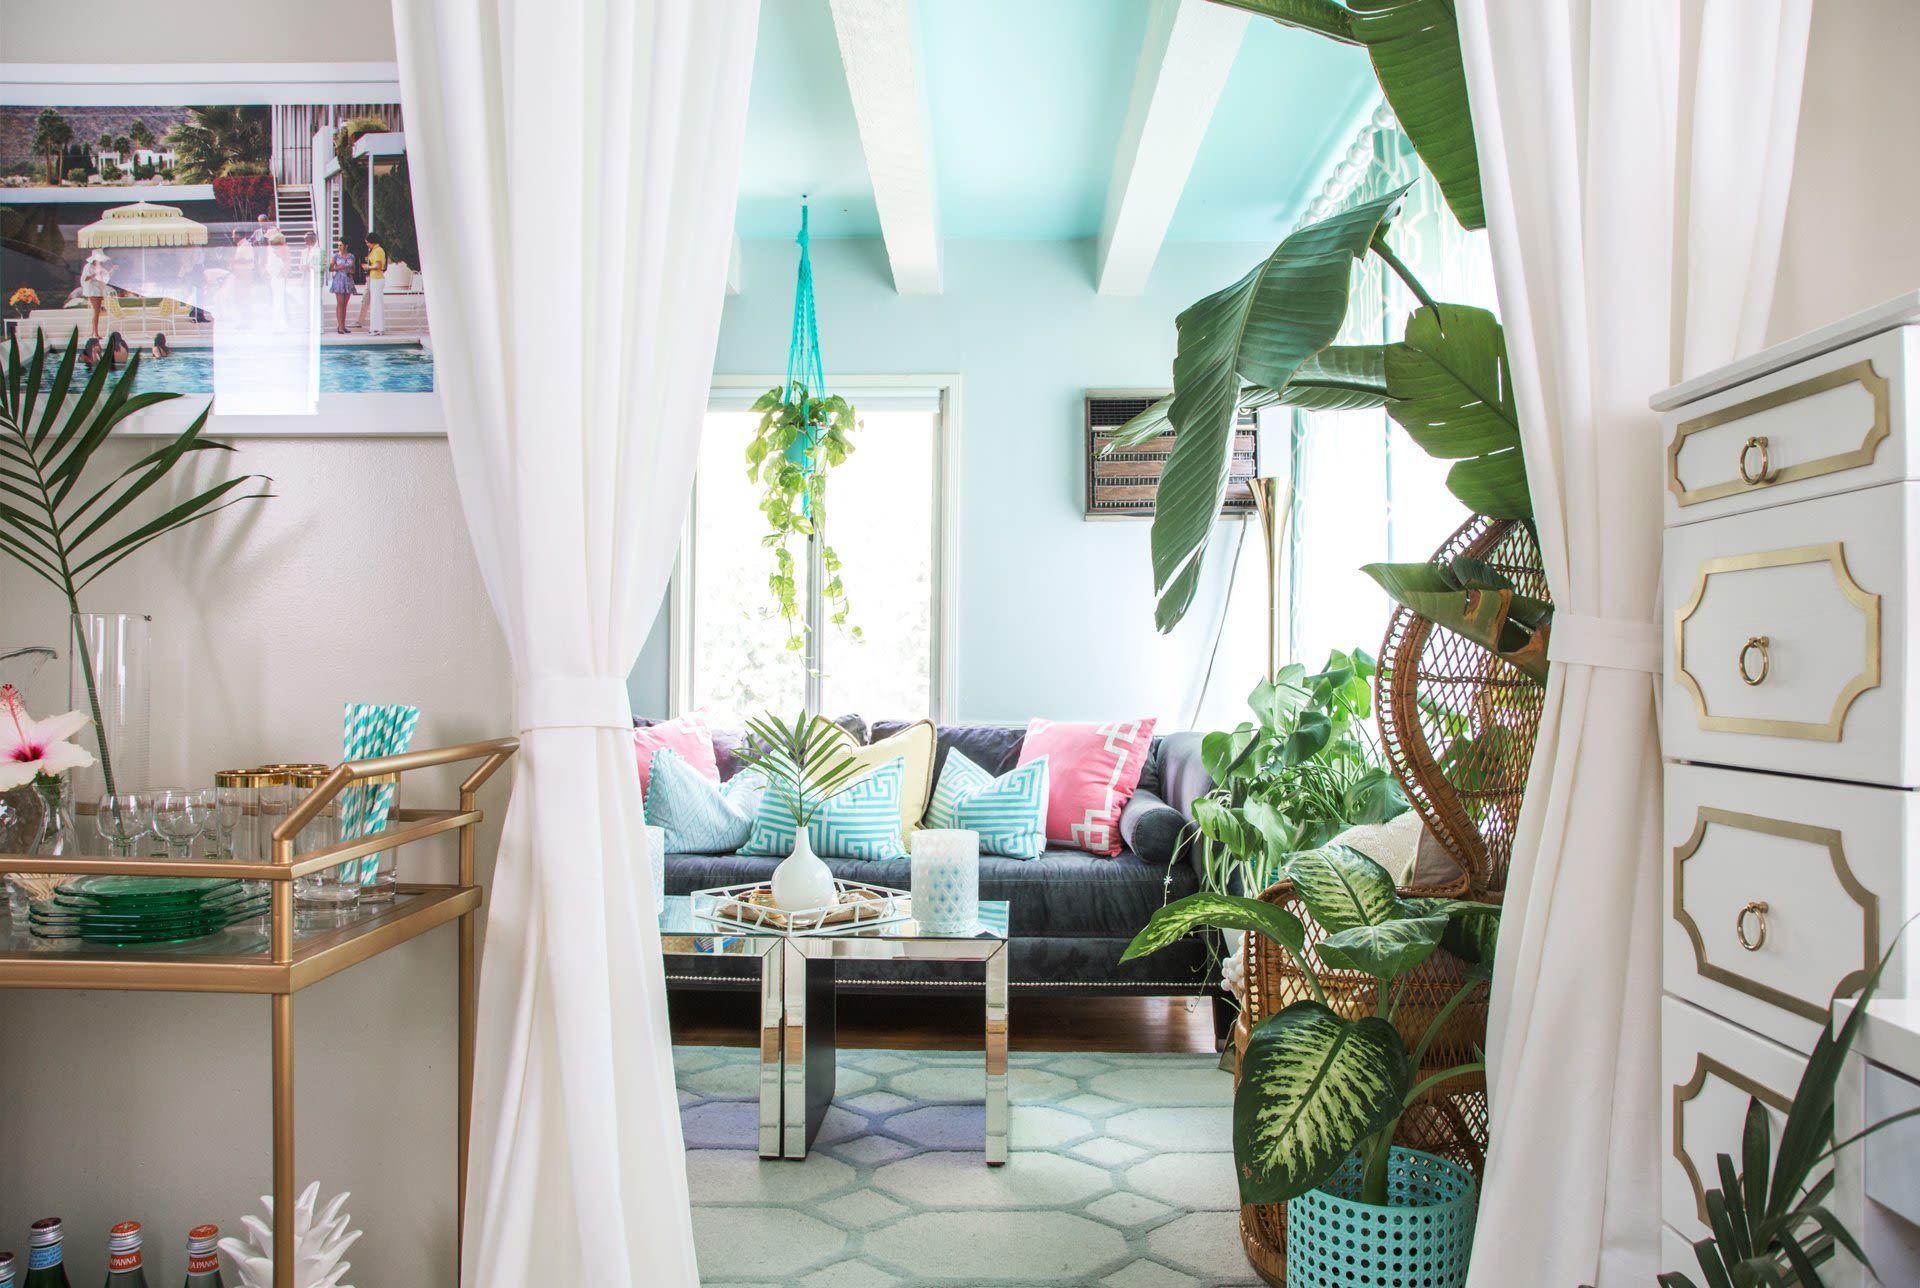 36 x 24 floorplan Small house floor plans, Log home